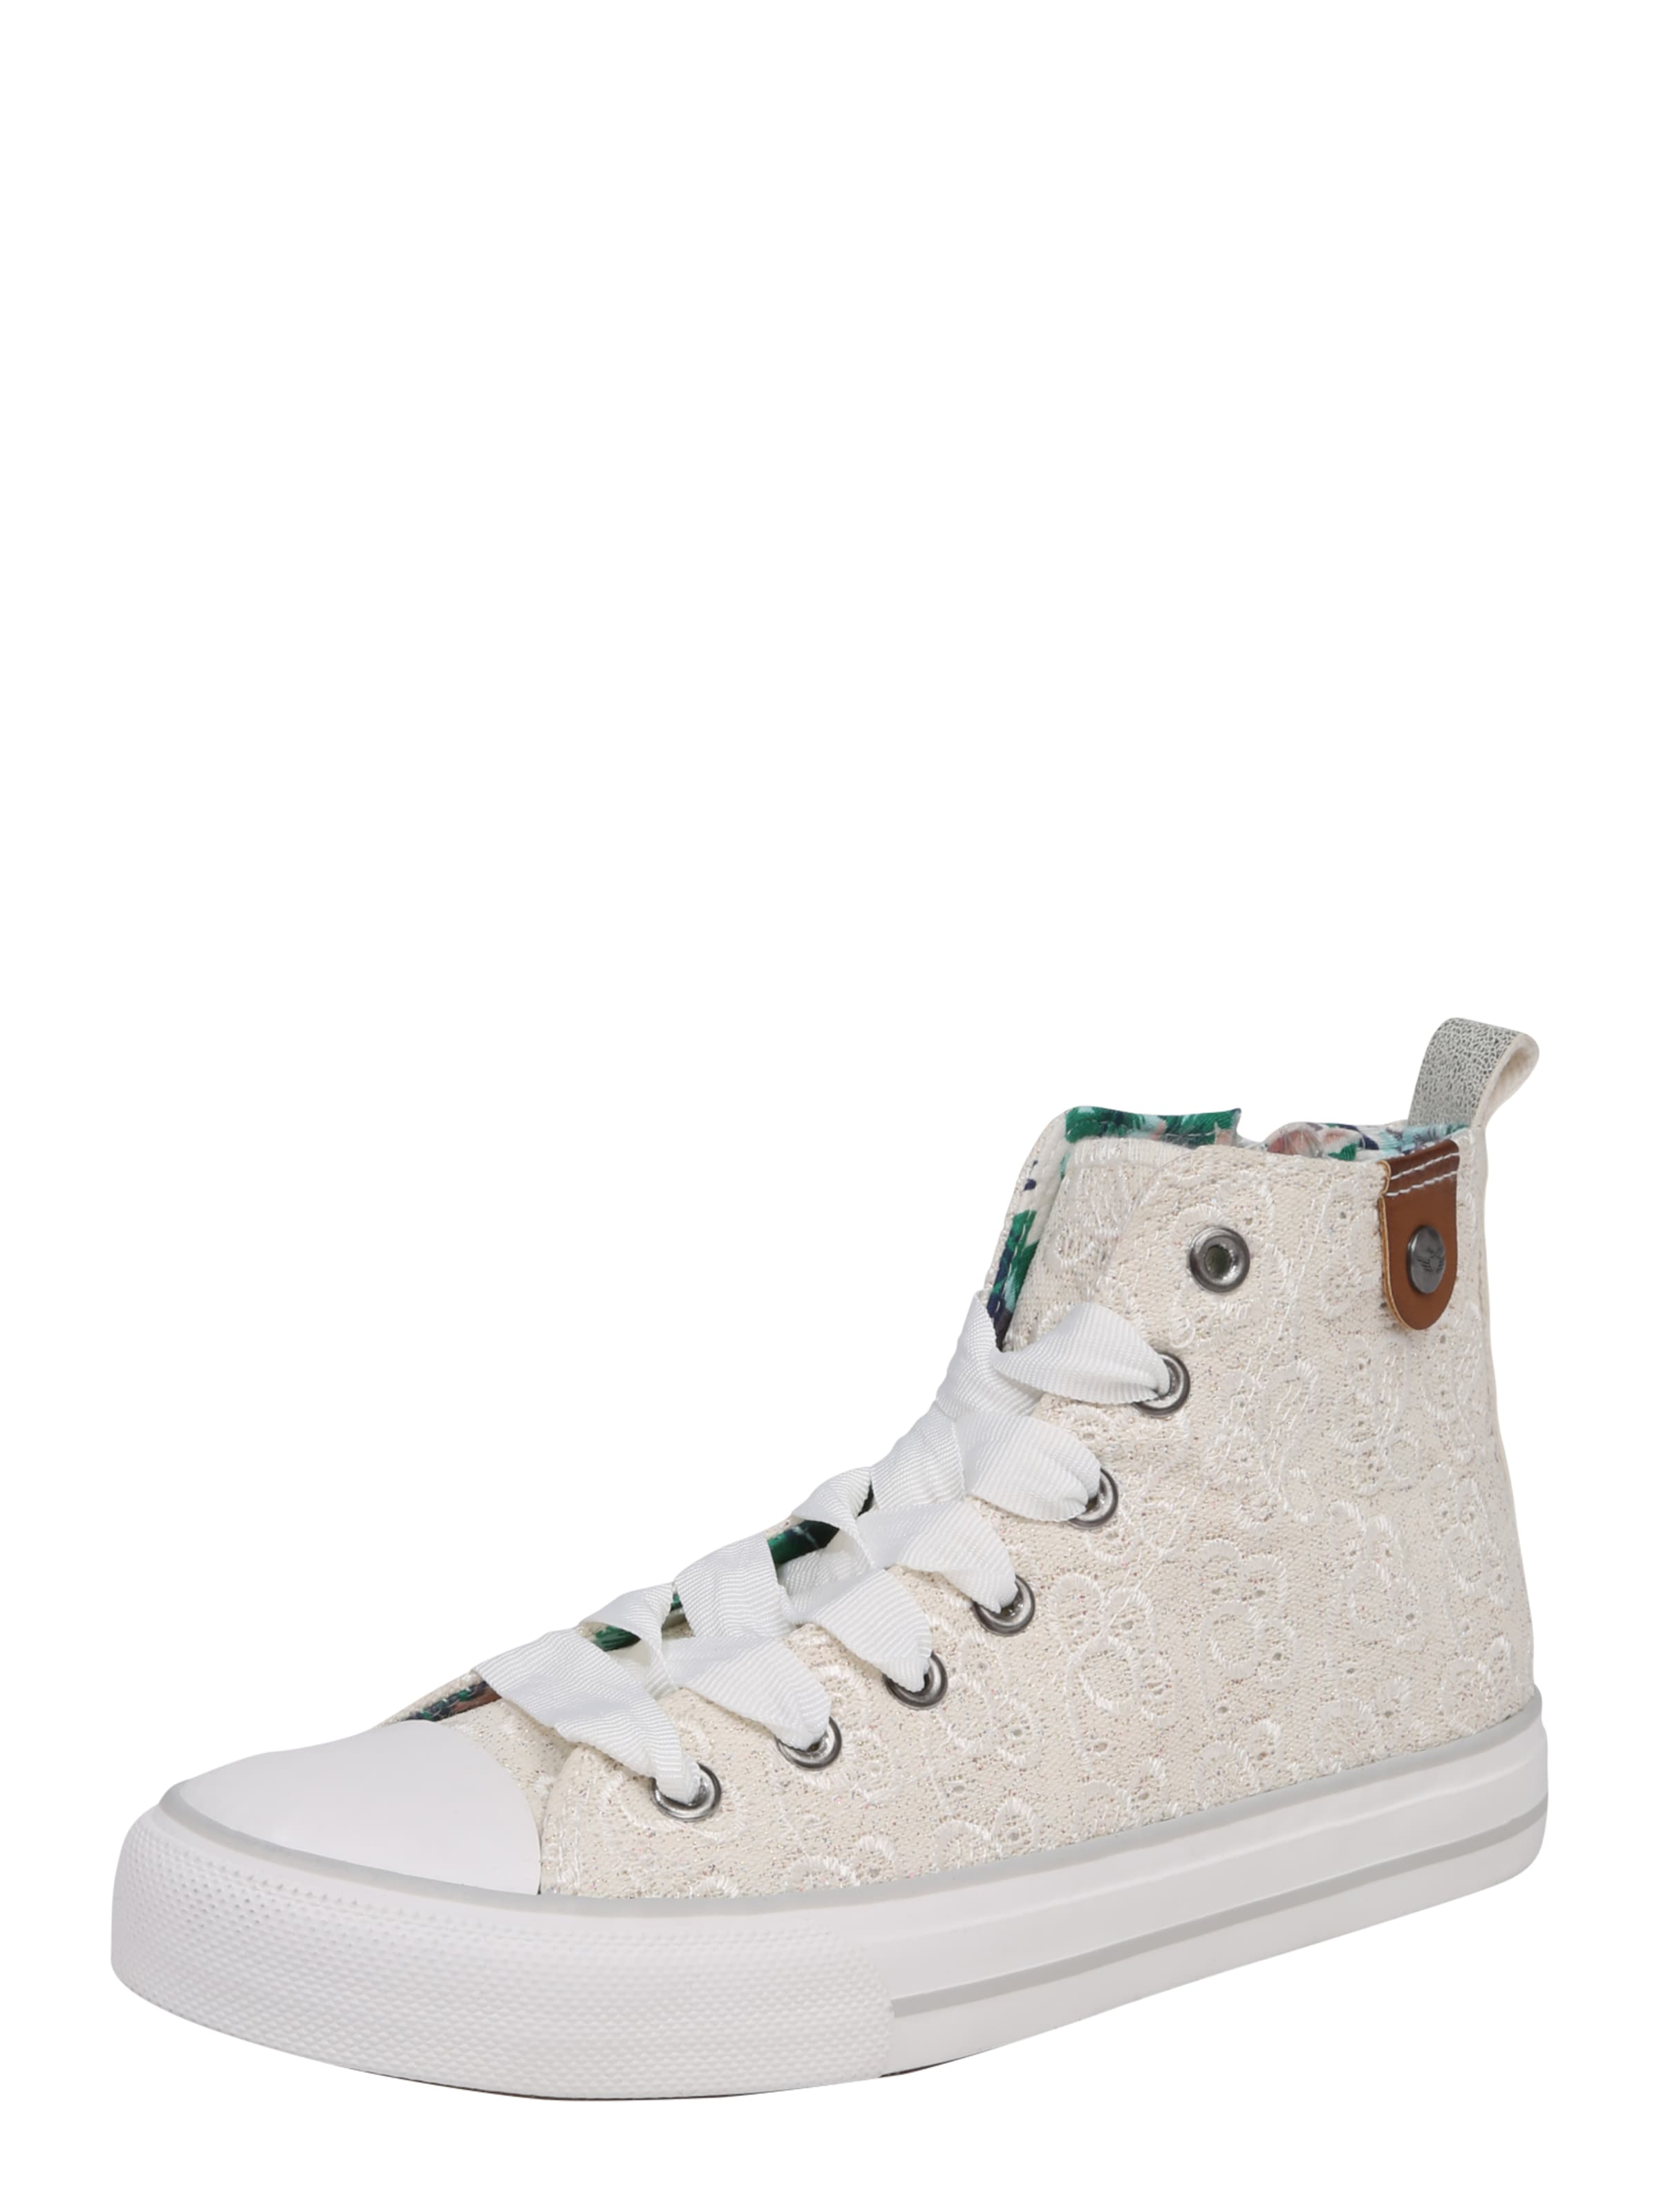 Fritzi aus Preußen Sneaker   Hedi Toe Cap Sneaker